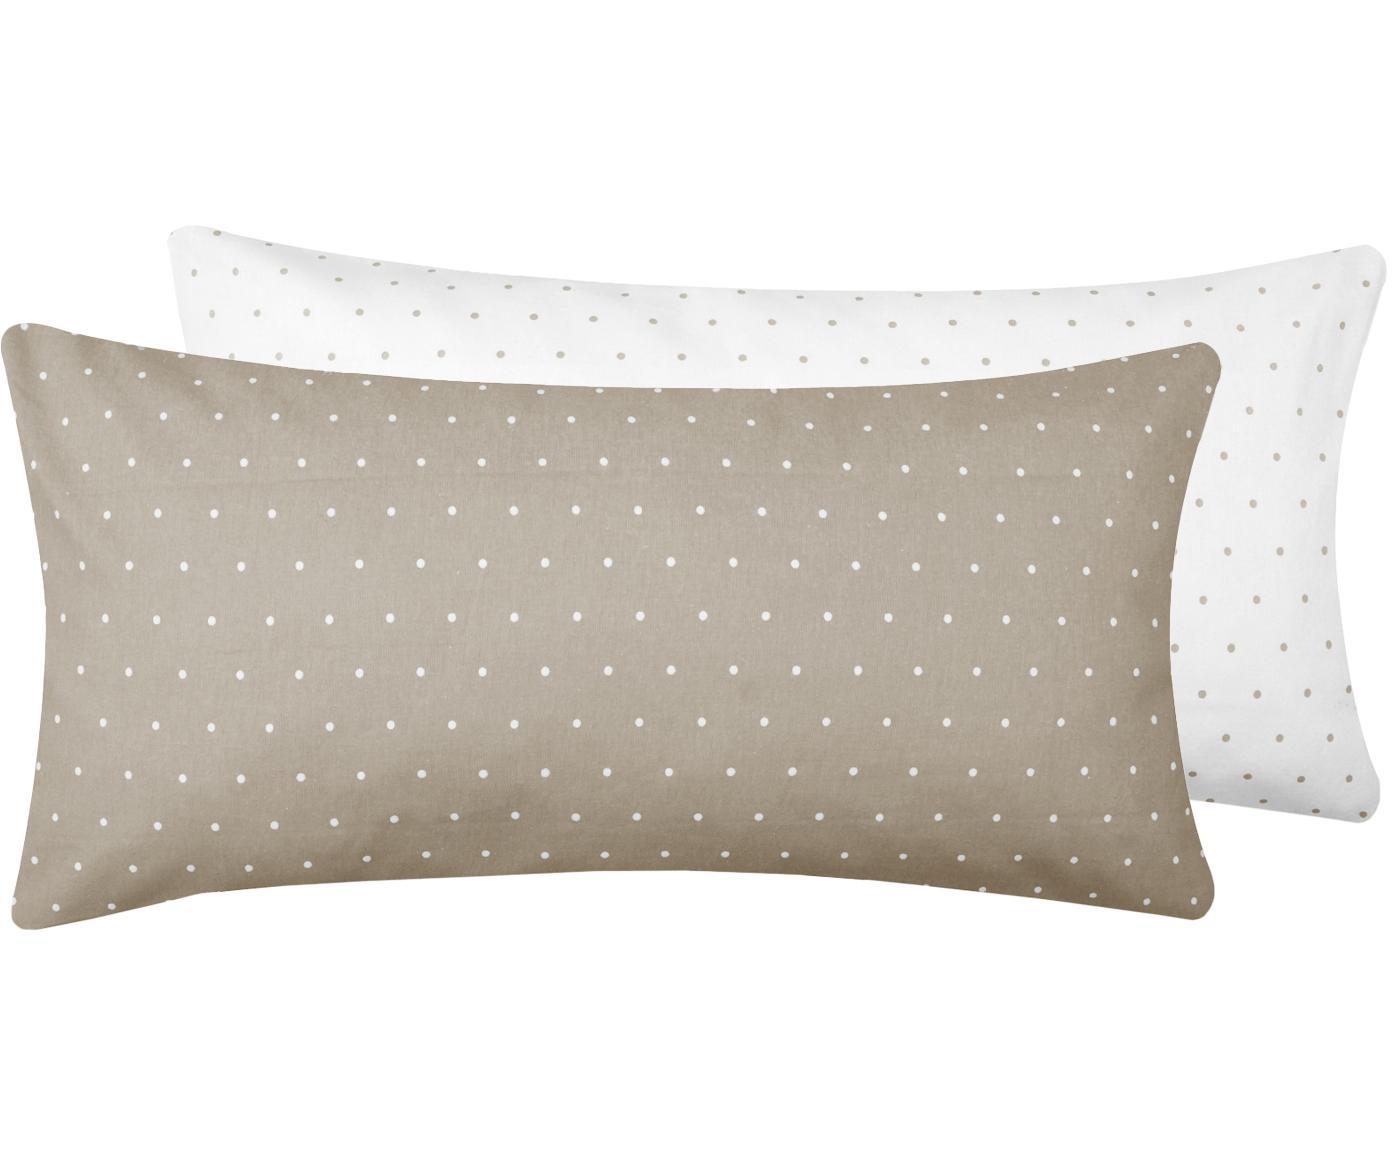 Dwustronna poszewka na poduszkę z flaneli Elisa, 2 szt., Beżowy, biały, S 40 x D 80 cm